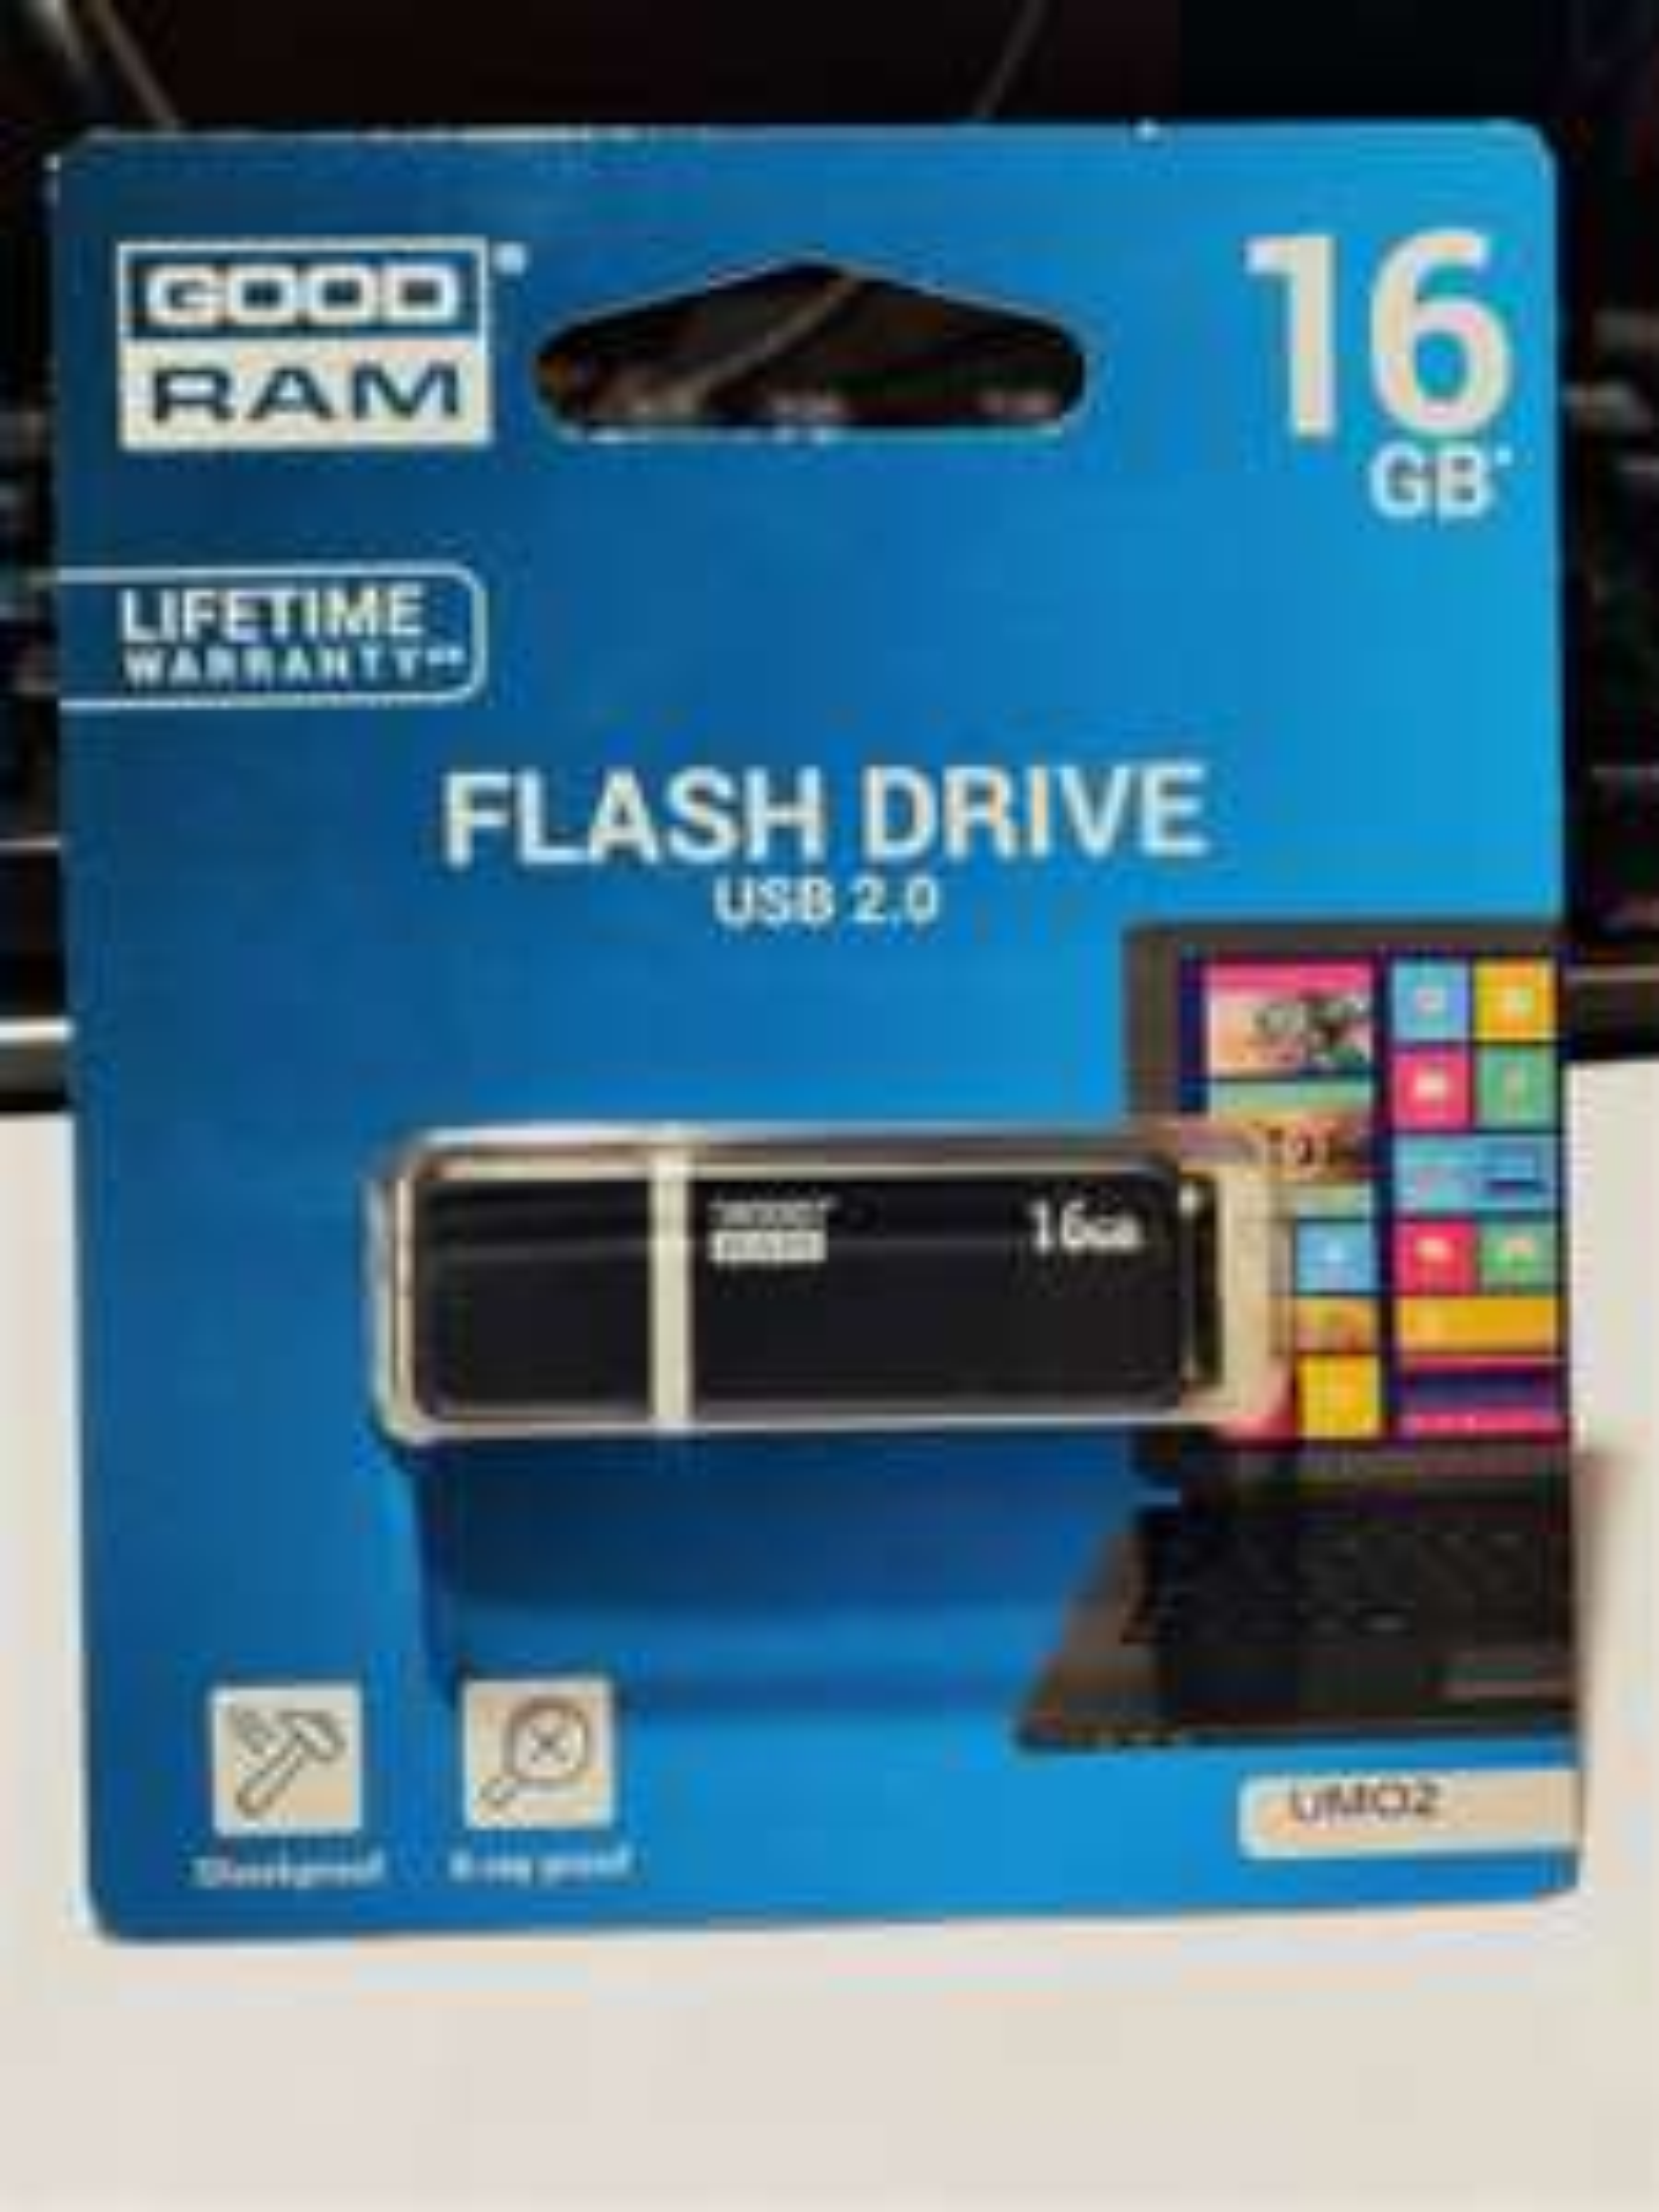 [MyCenter] GOODRAM UMO2 - 16 GB Pendrive USB 2.0